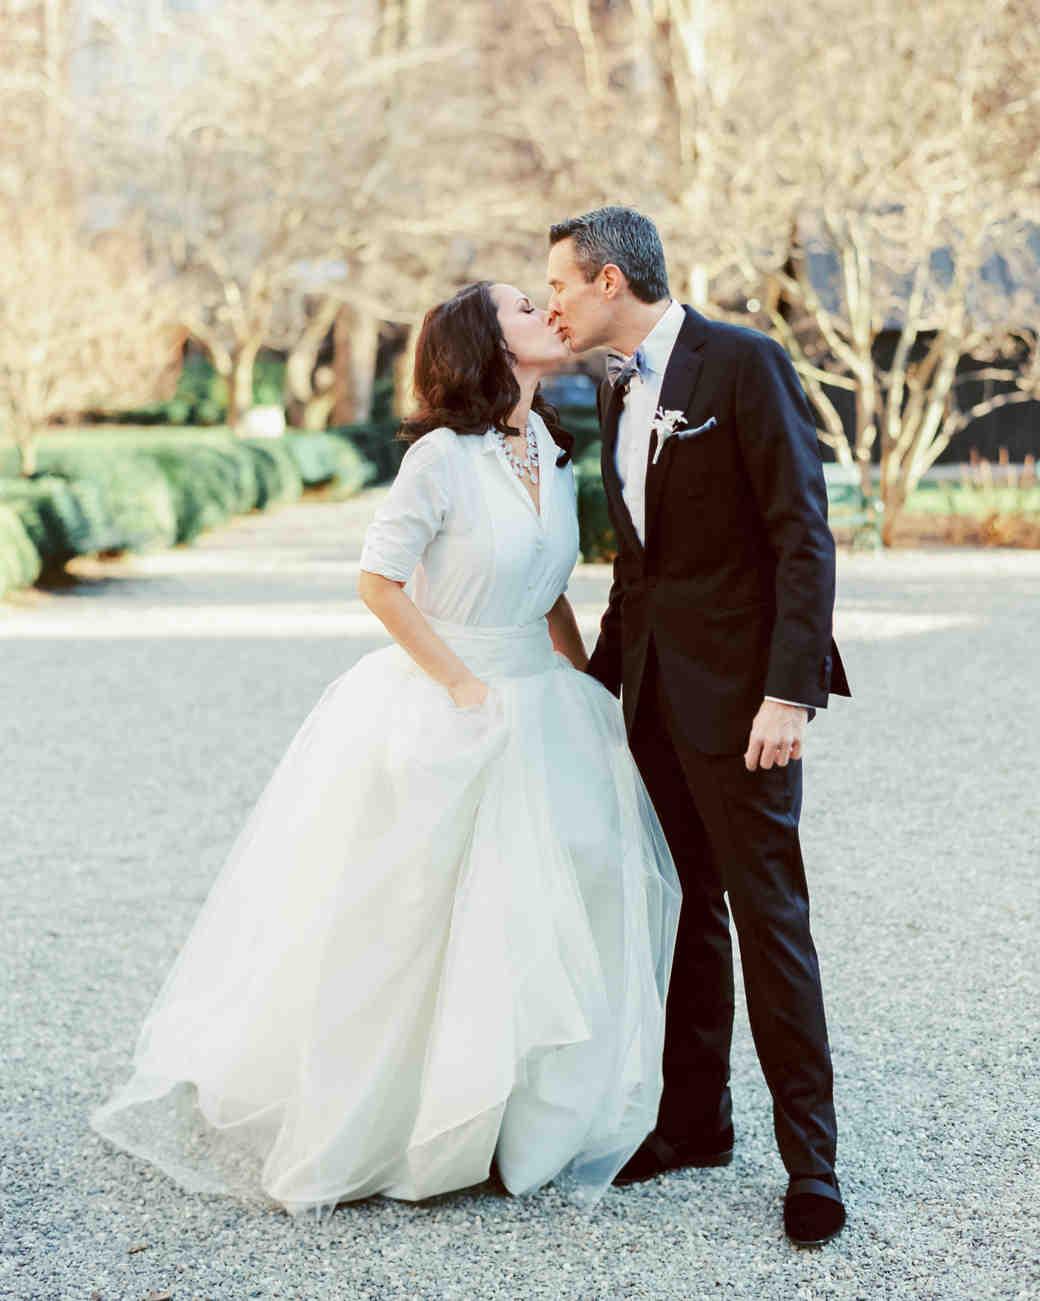 lori-jan-wedding-couple-00119-s112305-1215.jpg